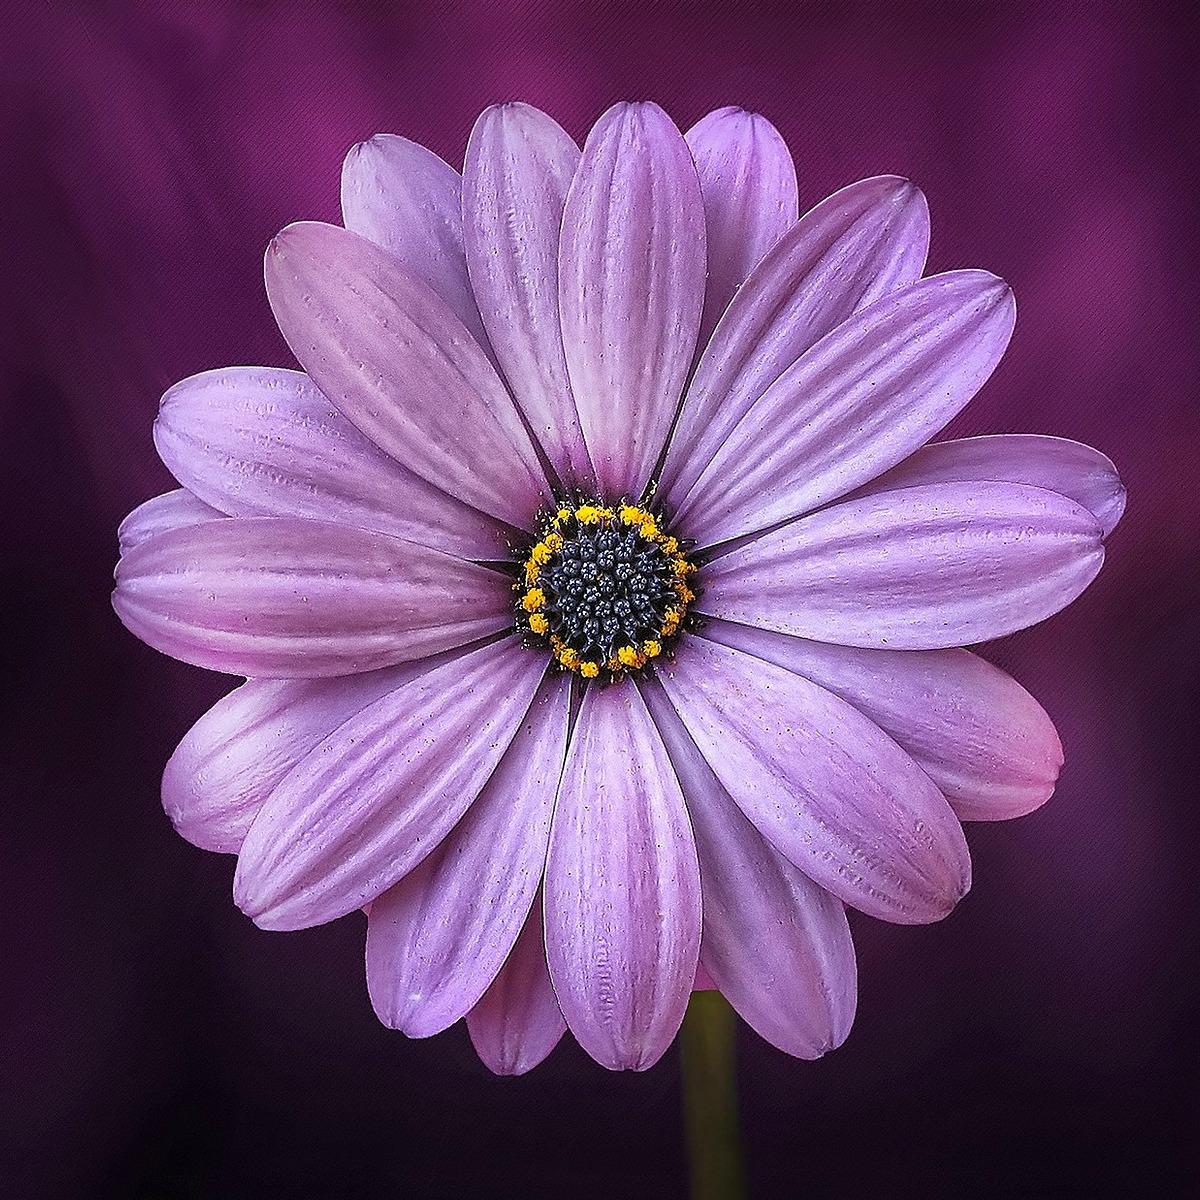 Purple Daisy_Square 1200x1200.jpg